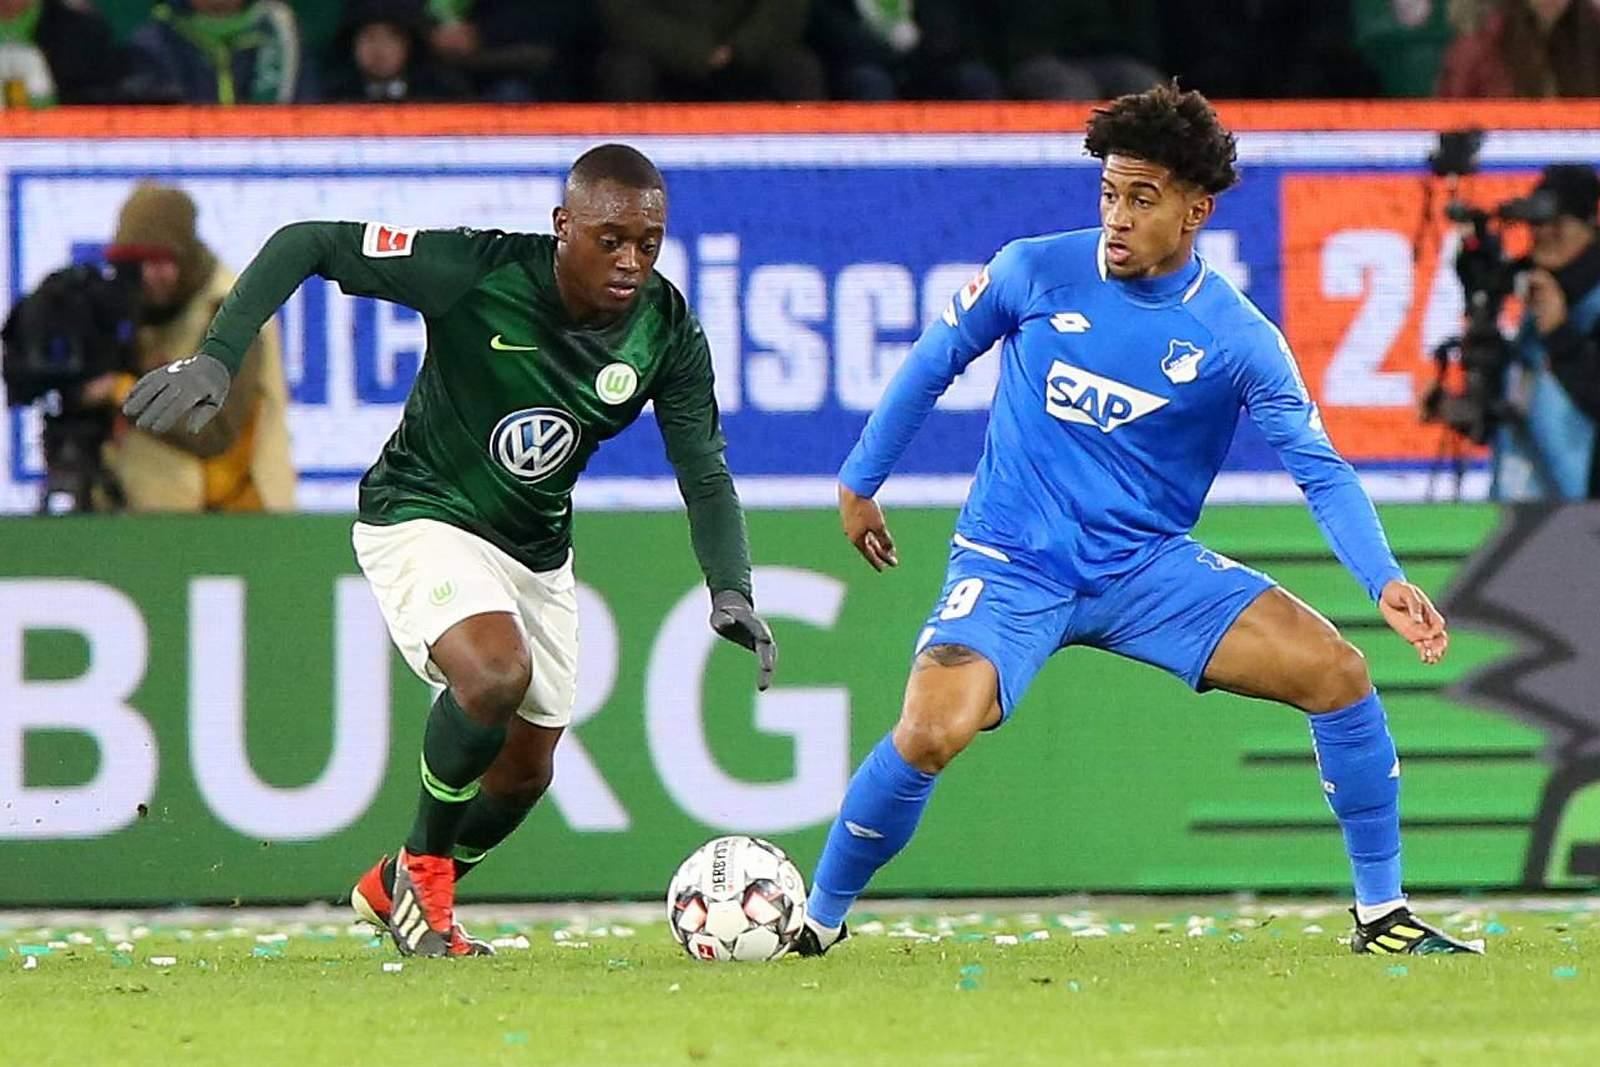 Prediksi Pertandingan Hoffenheim vs Wolfsburg Judi Bola Online BK8